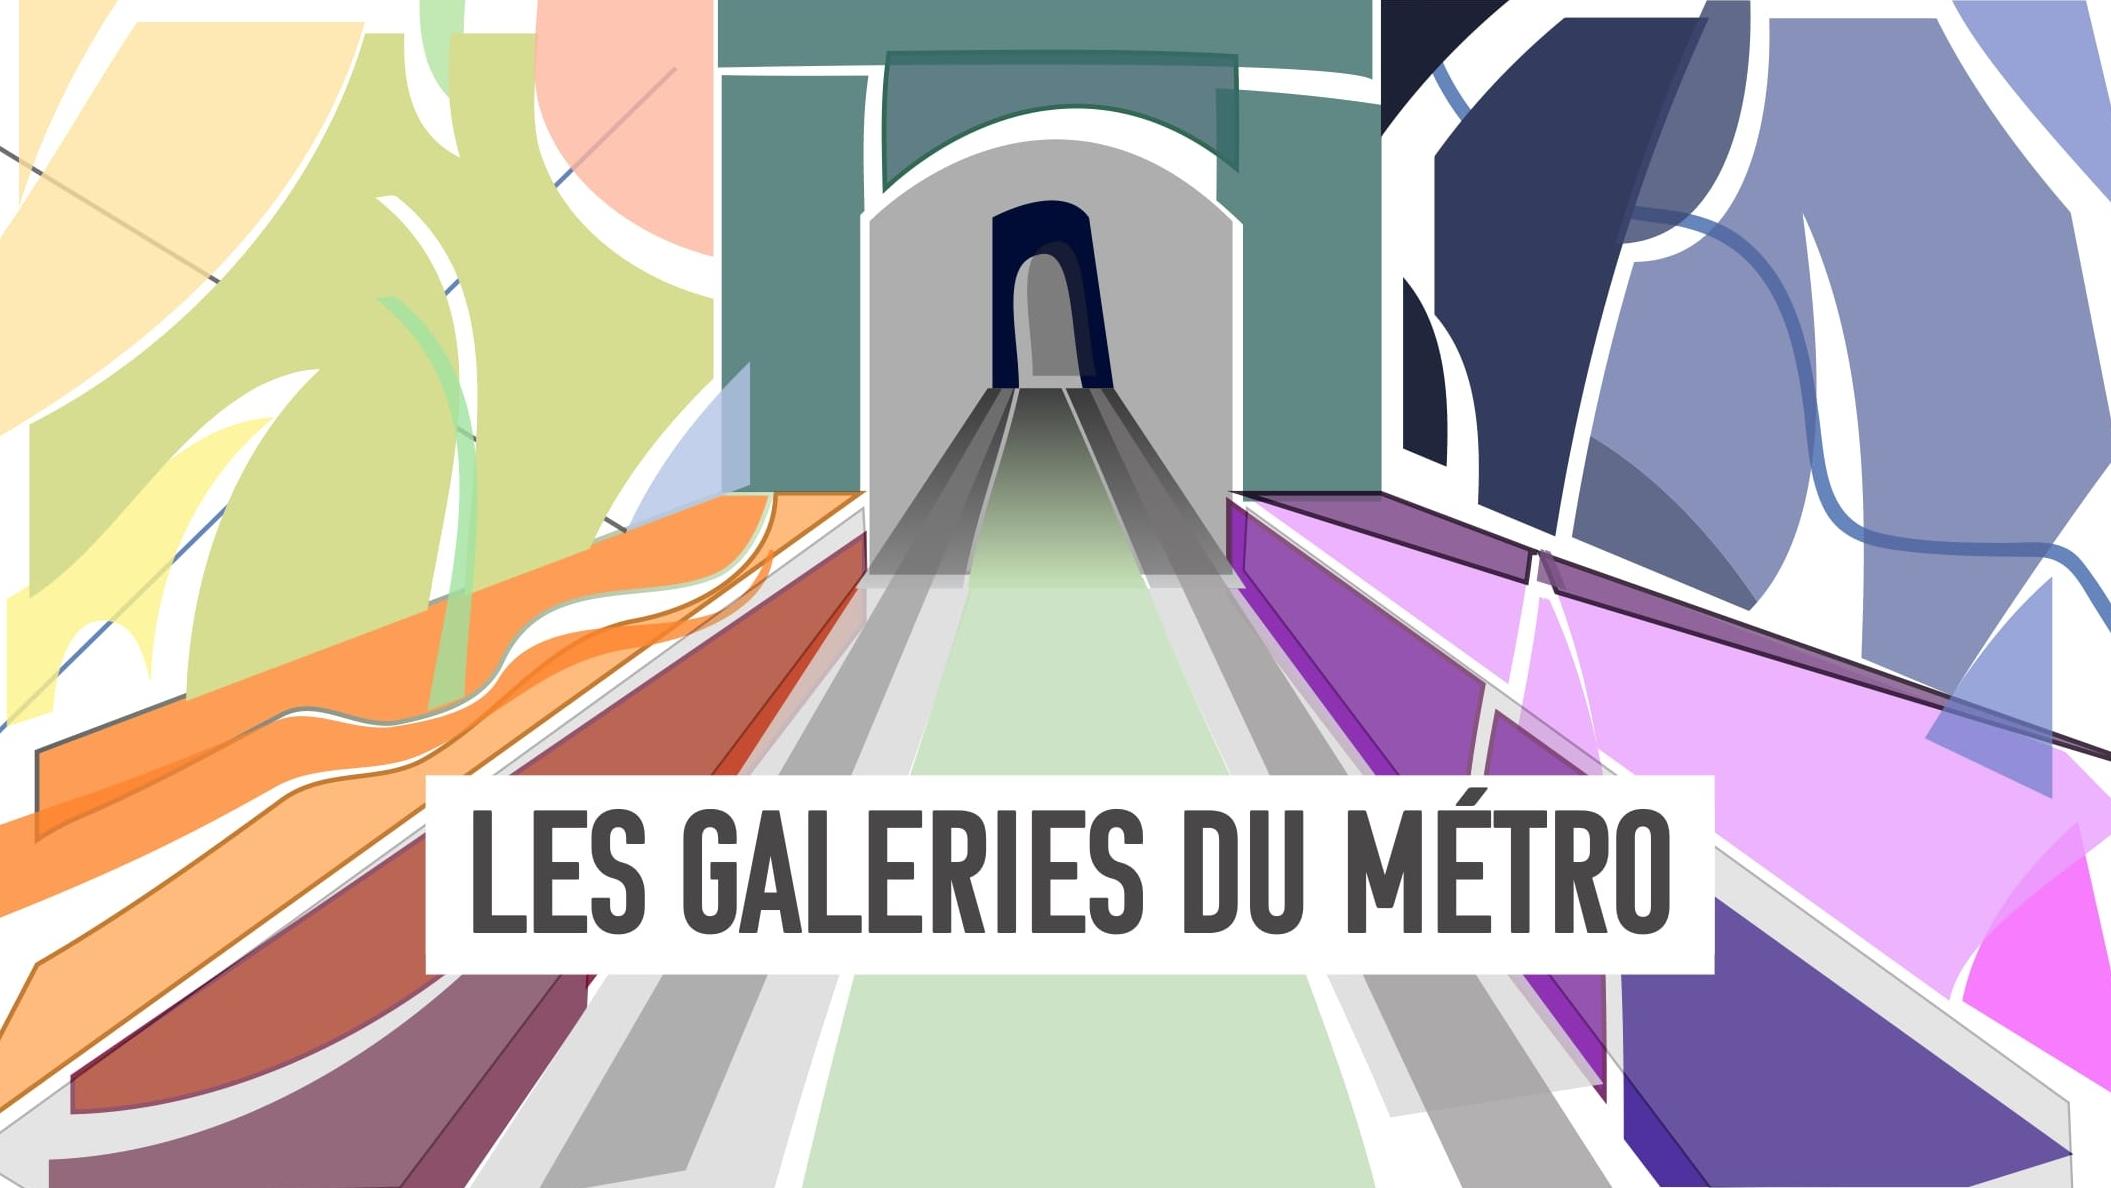 Les Galeries du Metro_1-01.jpg